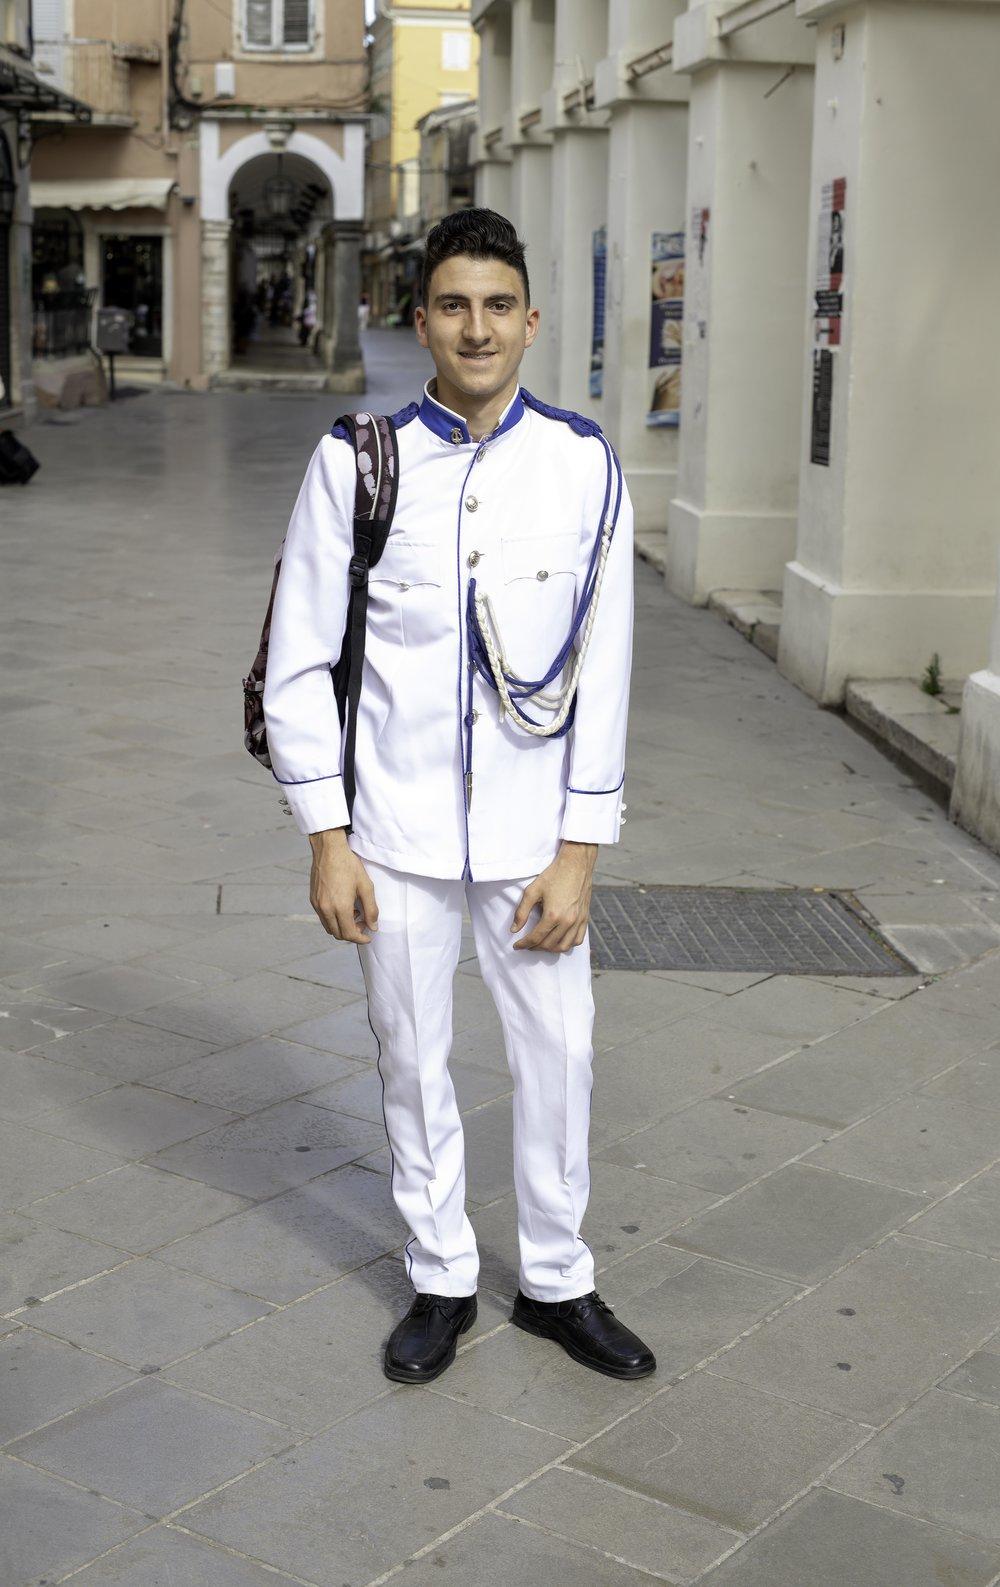 Parade Drummer in Corfu WEB Jpeg.jpg